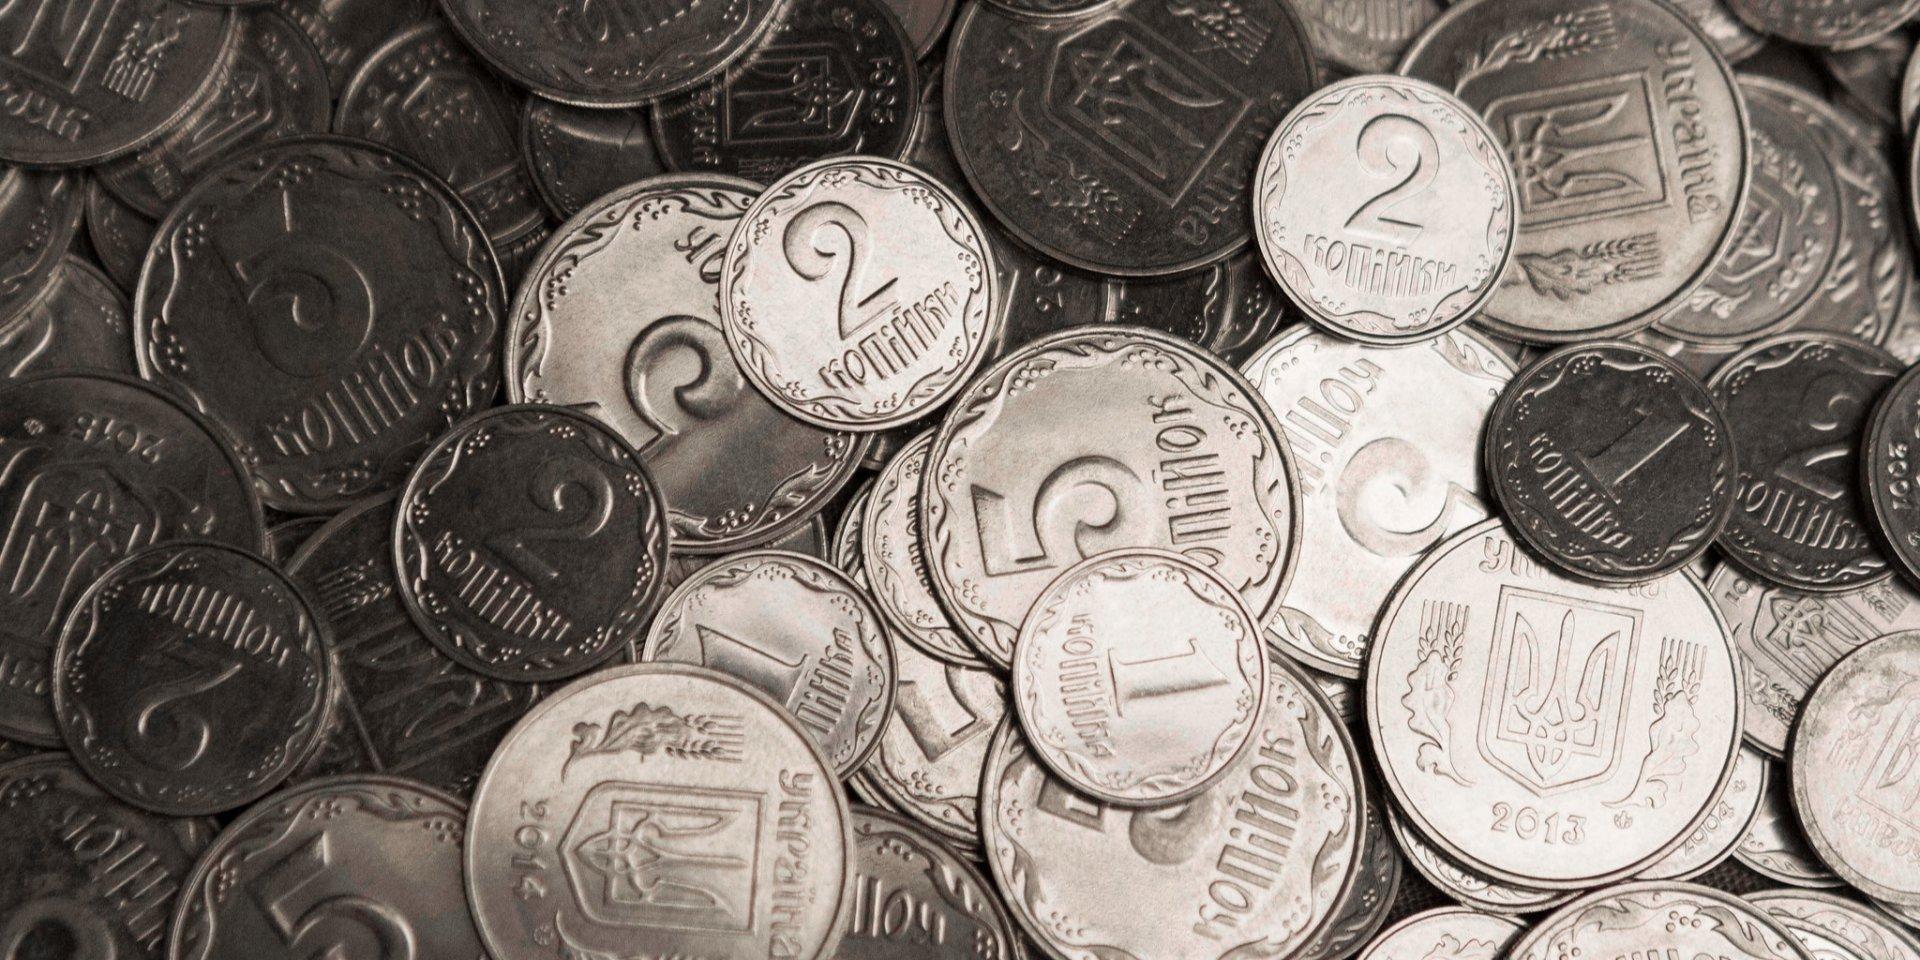 💰 Z 1 žovtnja skasovujeťsja rozrahunok monetamy po 1, 2 ta 5 kopijok: de obminjaty ta «zaokruglennja» u čeku